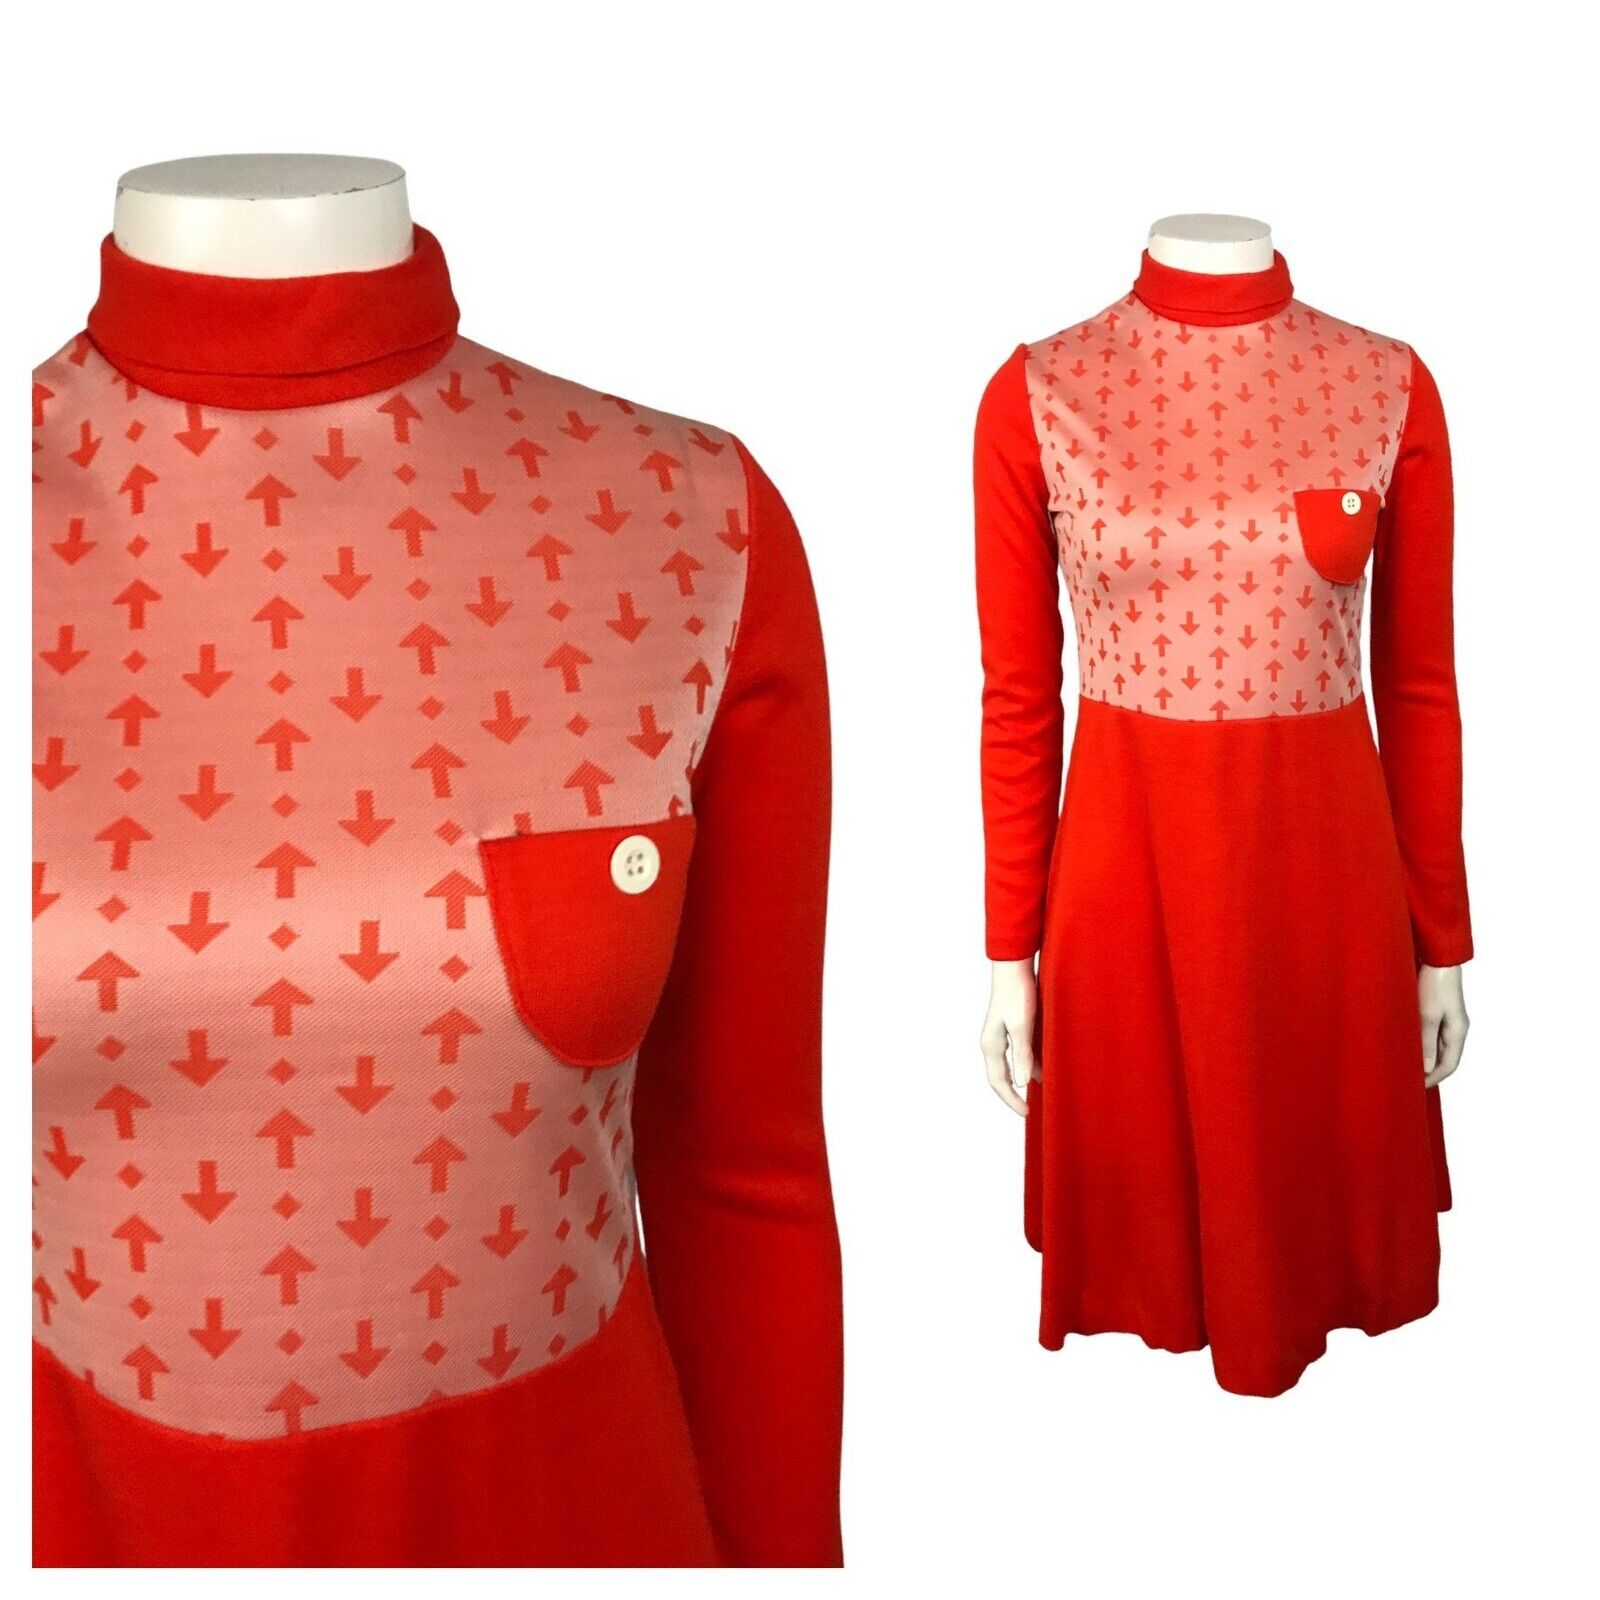 1960s Novelty Print Mod Dress / Orange Arrow Print Dress Long Sleeve / XS